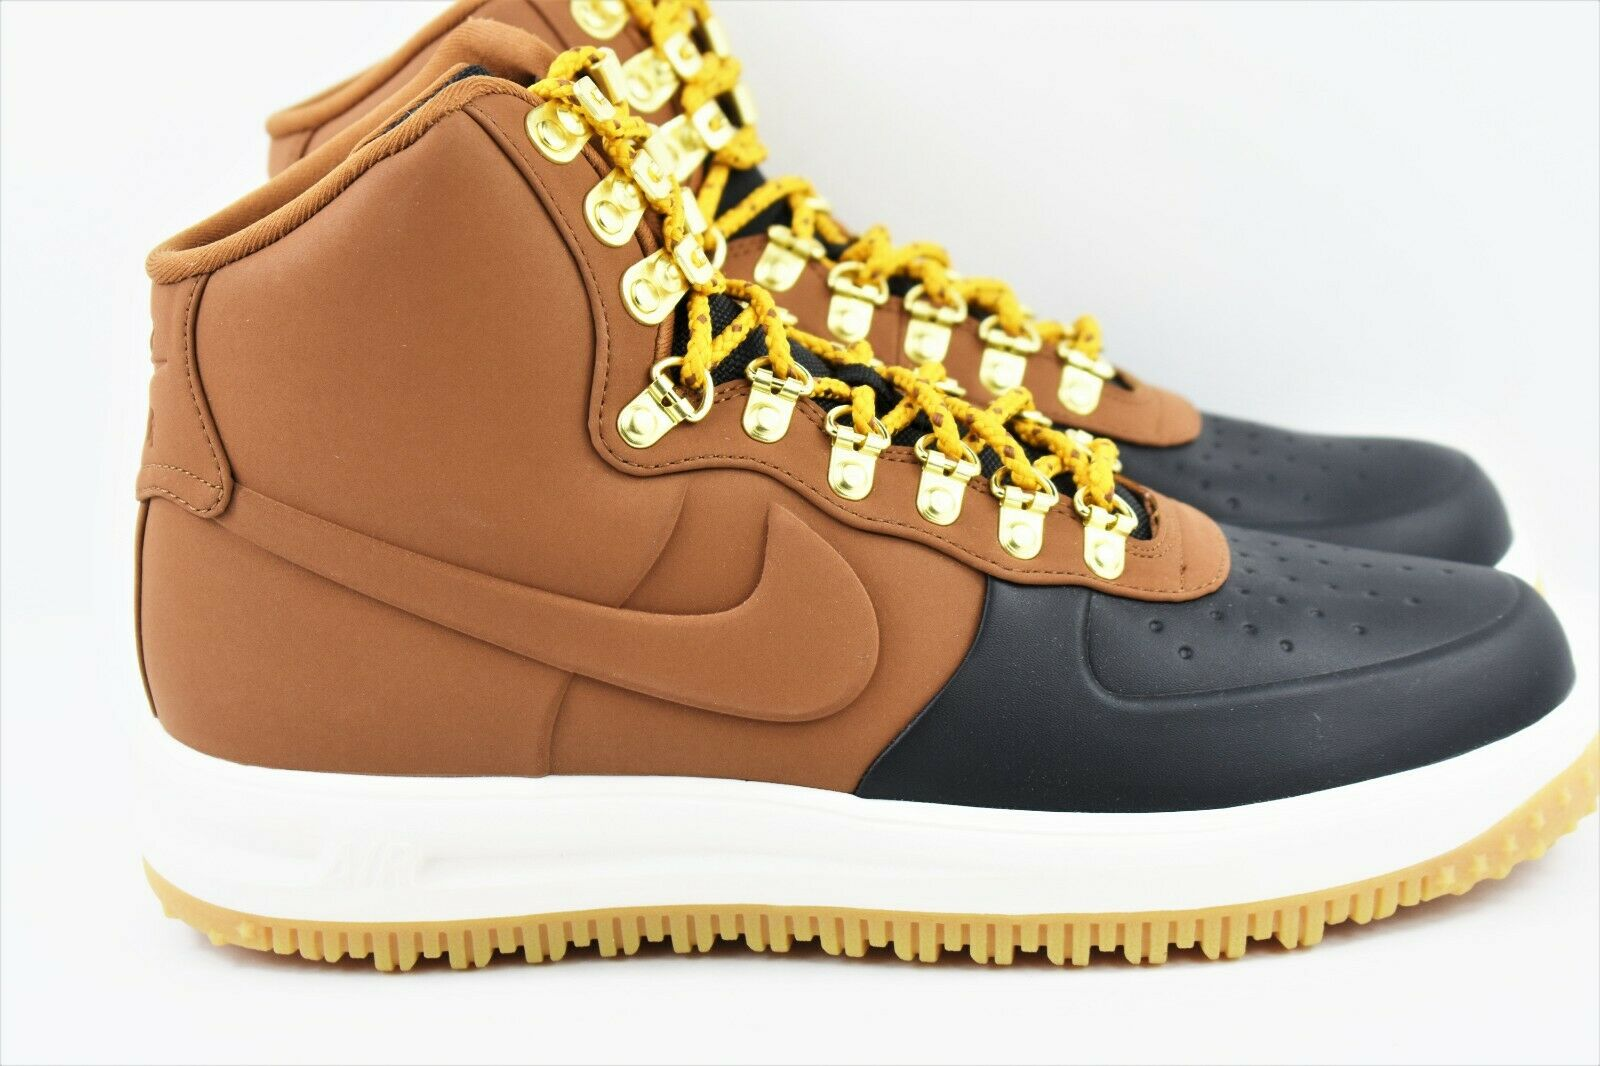 Nike Lunar Force 1 Duckboot High Mens Size 11 shoes LF1 BQ7930 001 Brown Black